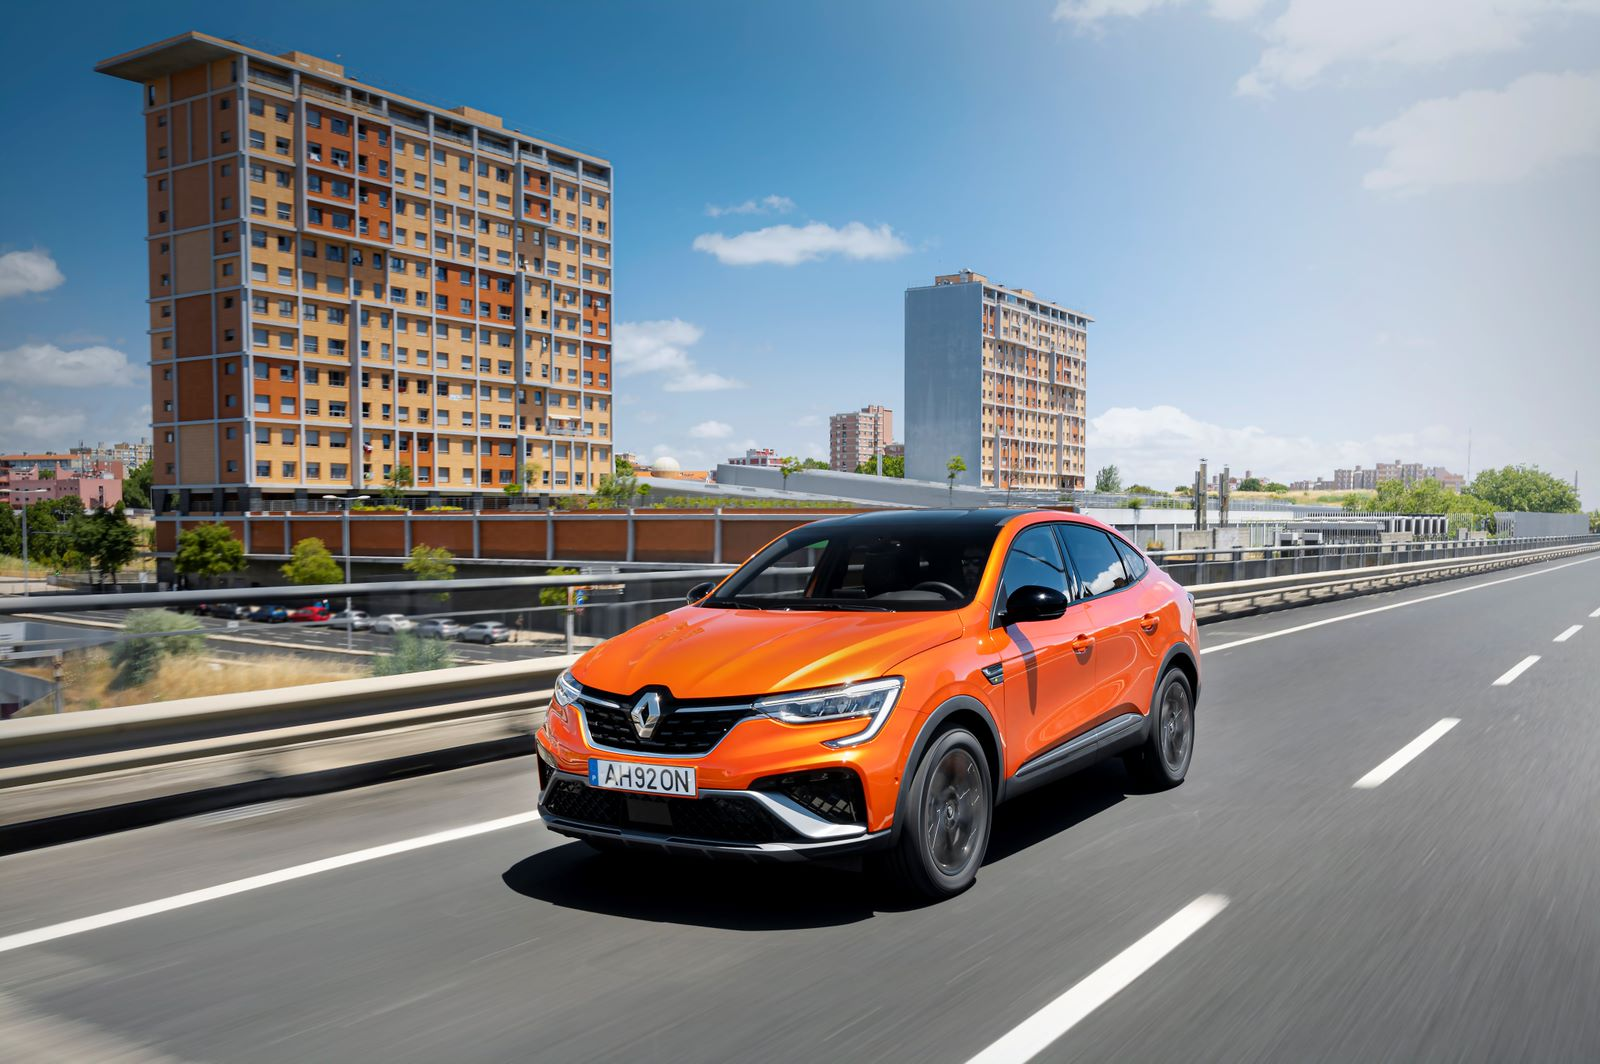 Renault Arkana chega para democratizar o estilo SUV Coupé